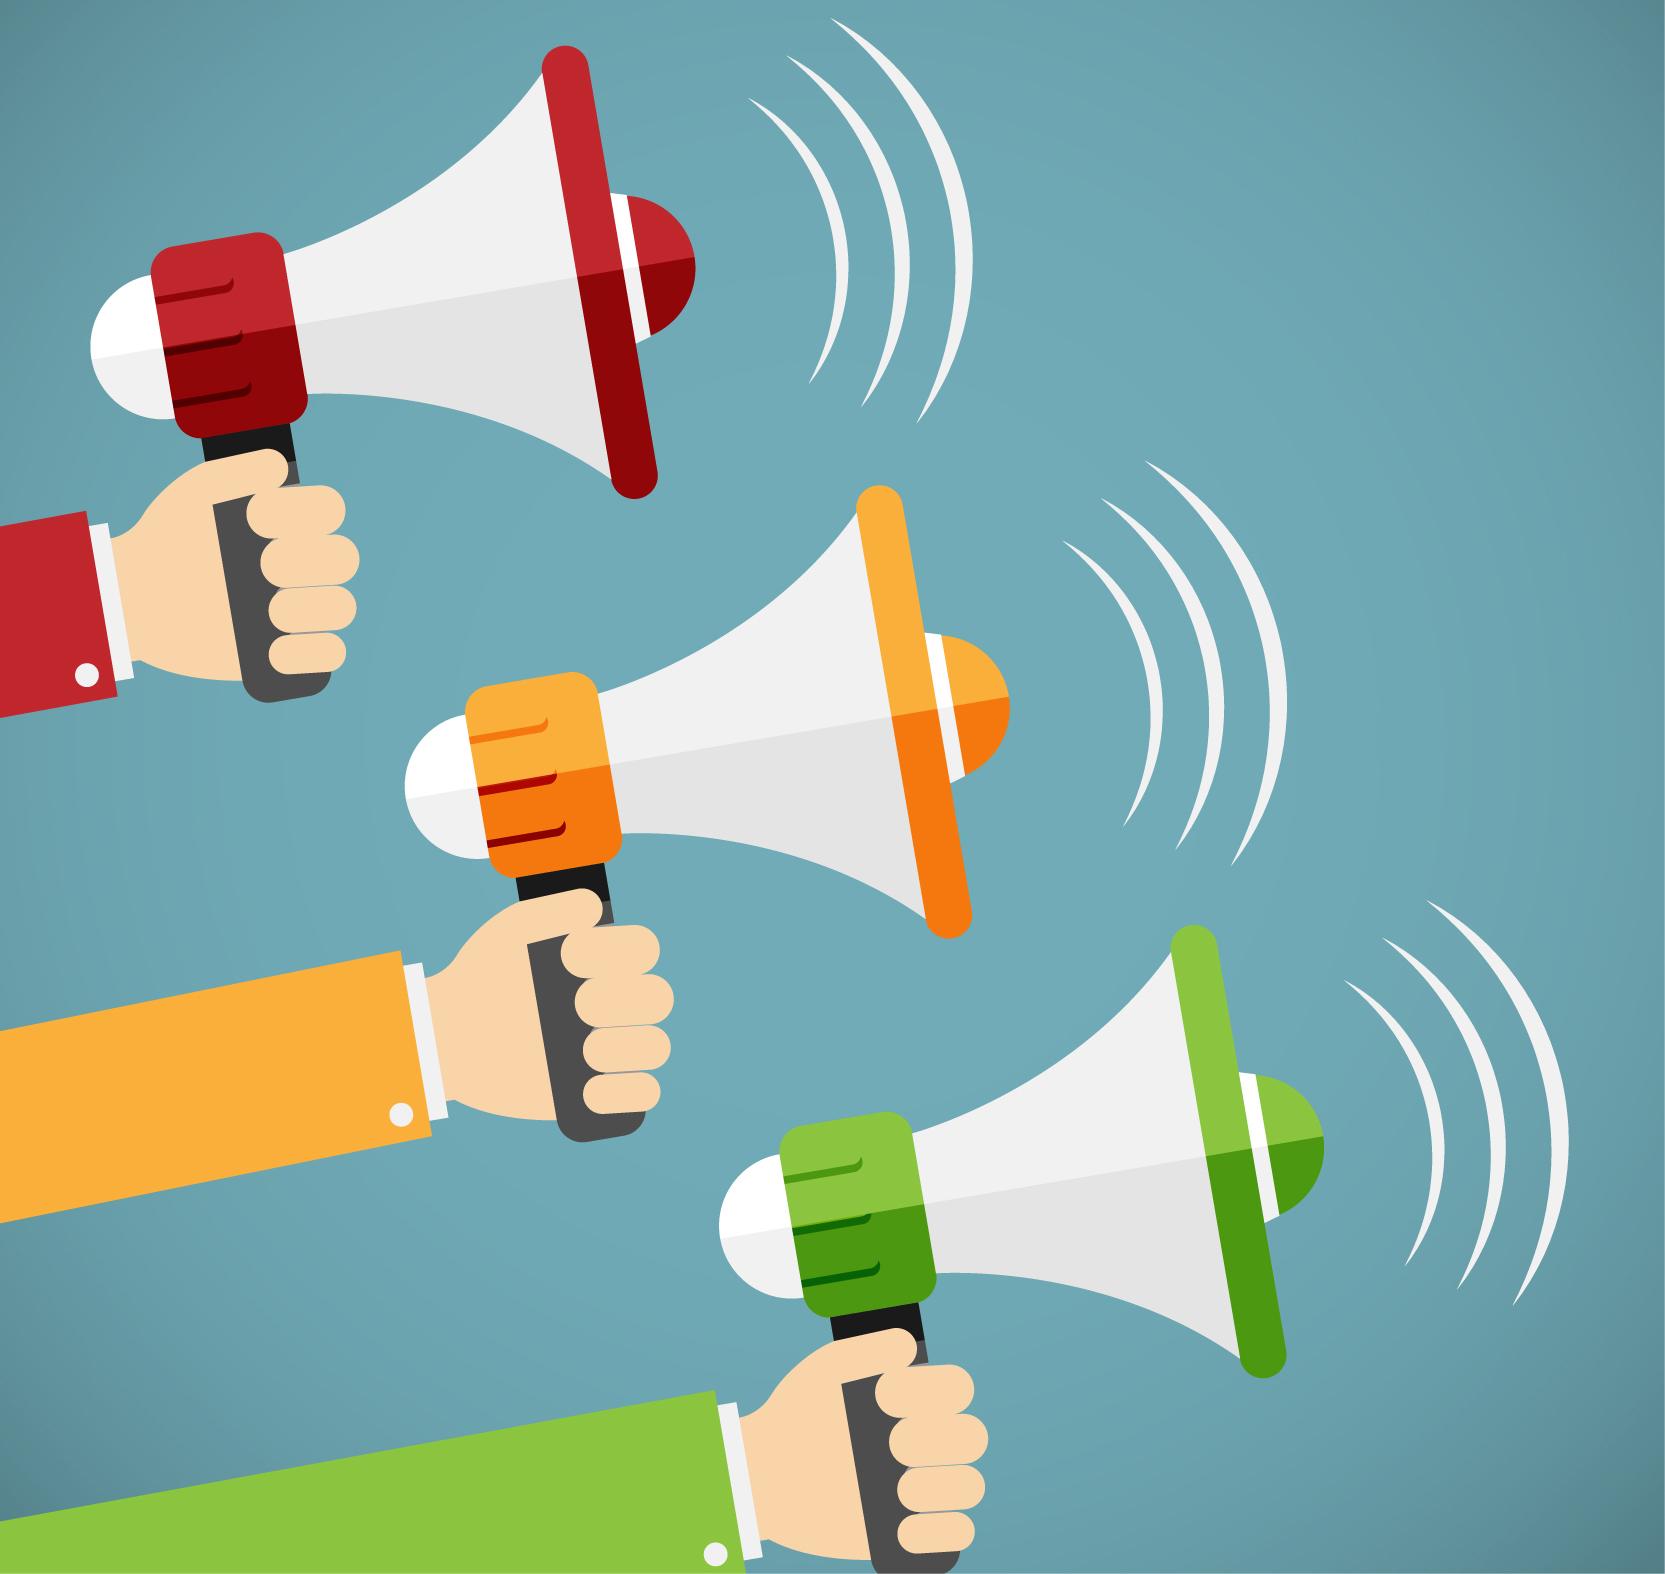 #UTSTLF17 snapshot: using debates as a learning and teaching tool